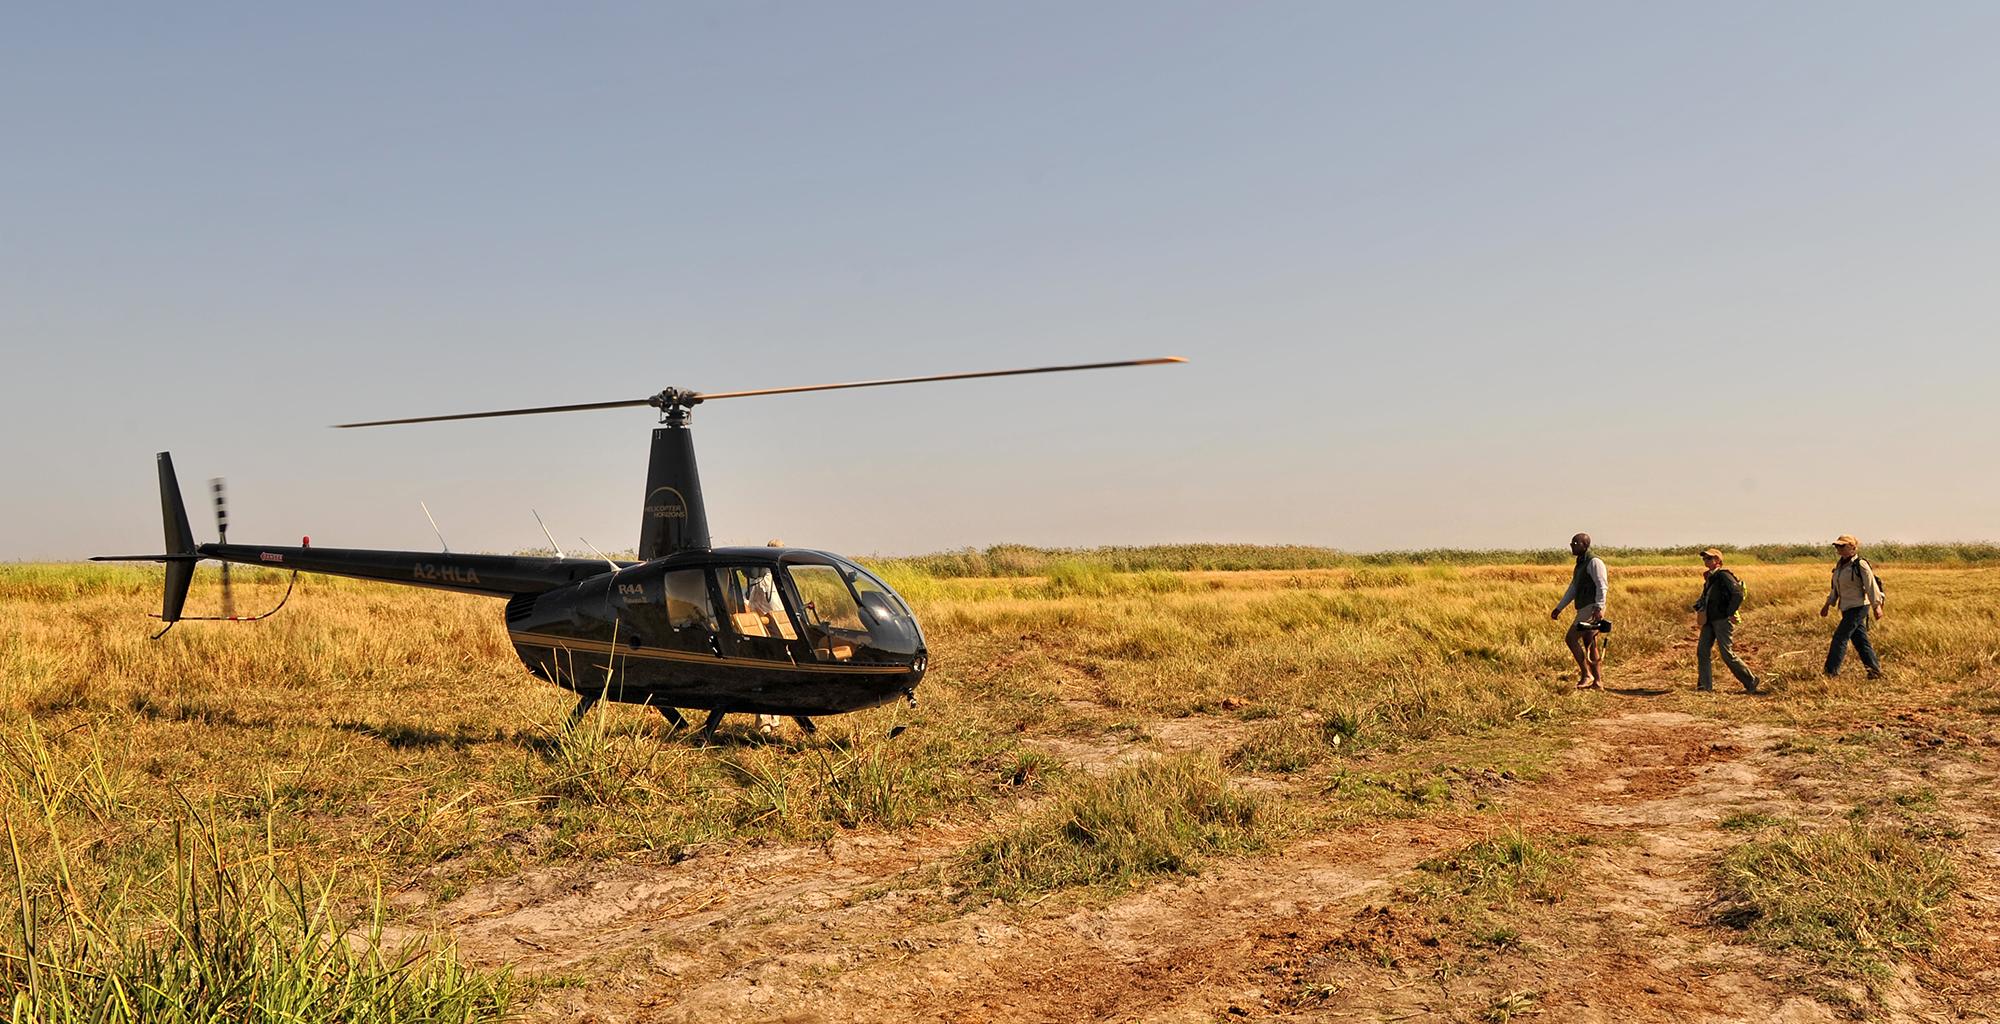 Botswana-Chobe-Enclave-Helicopter